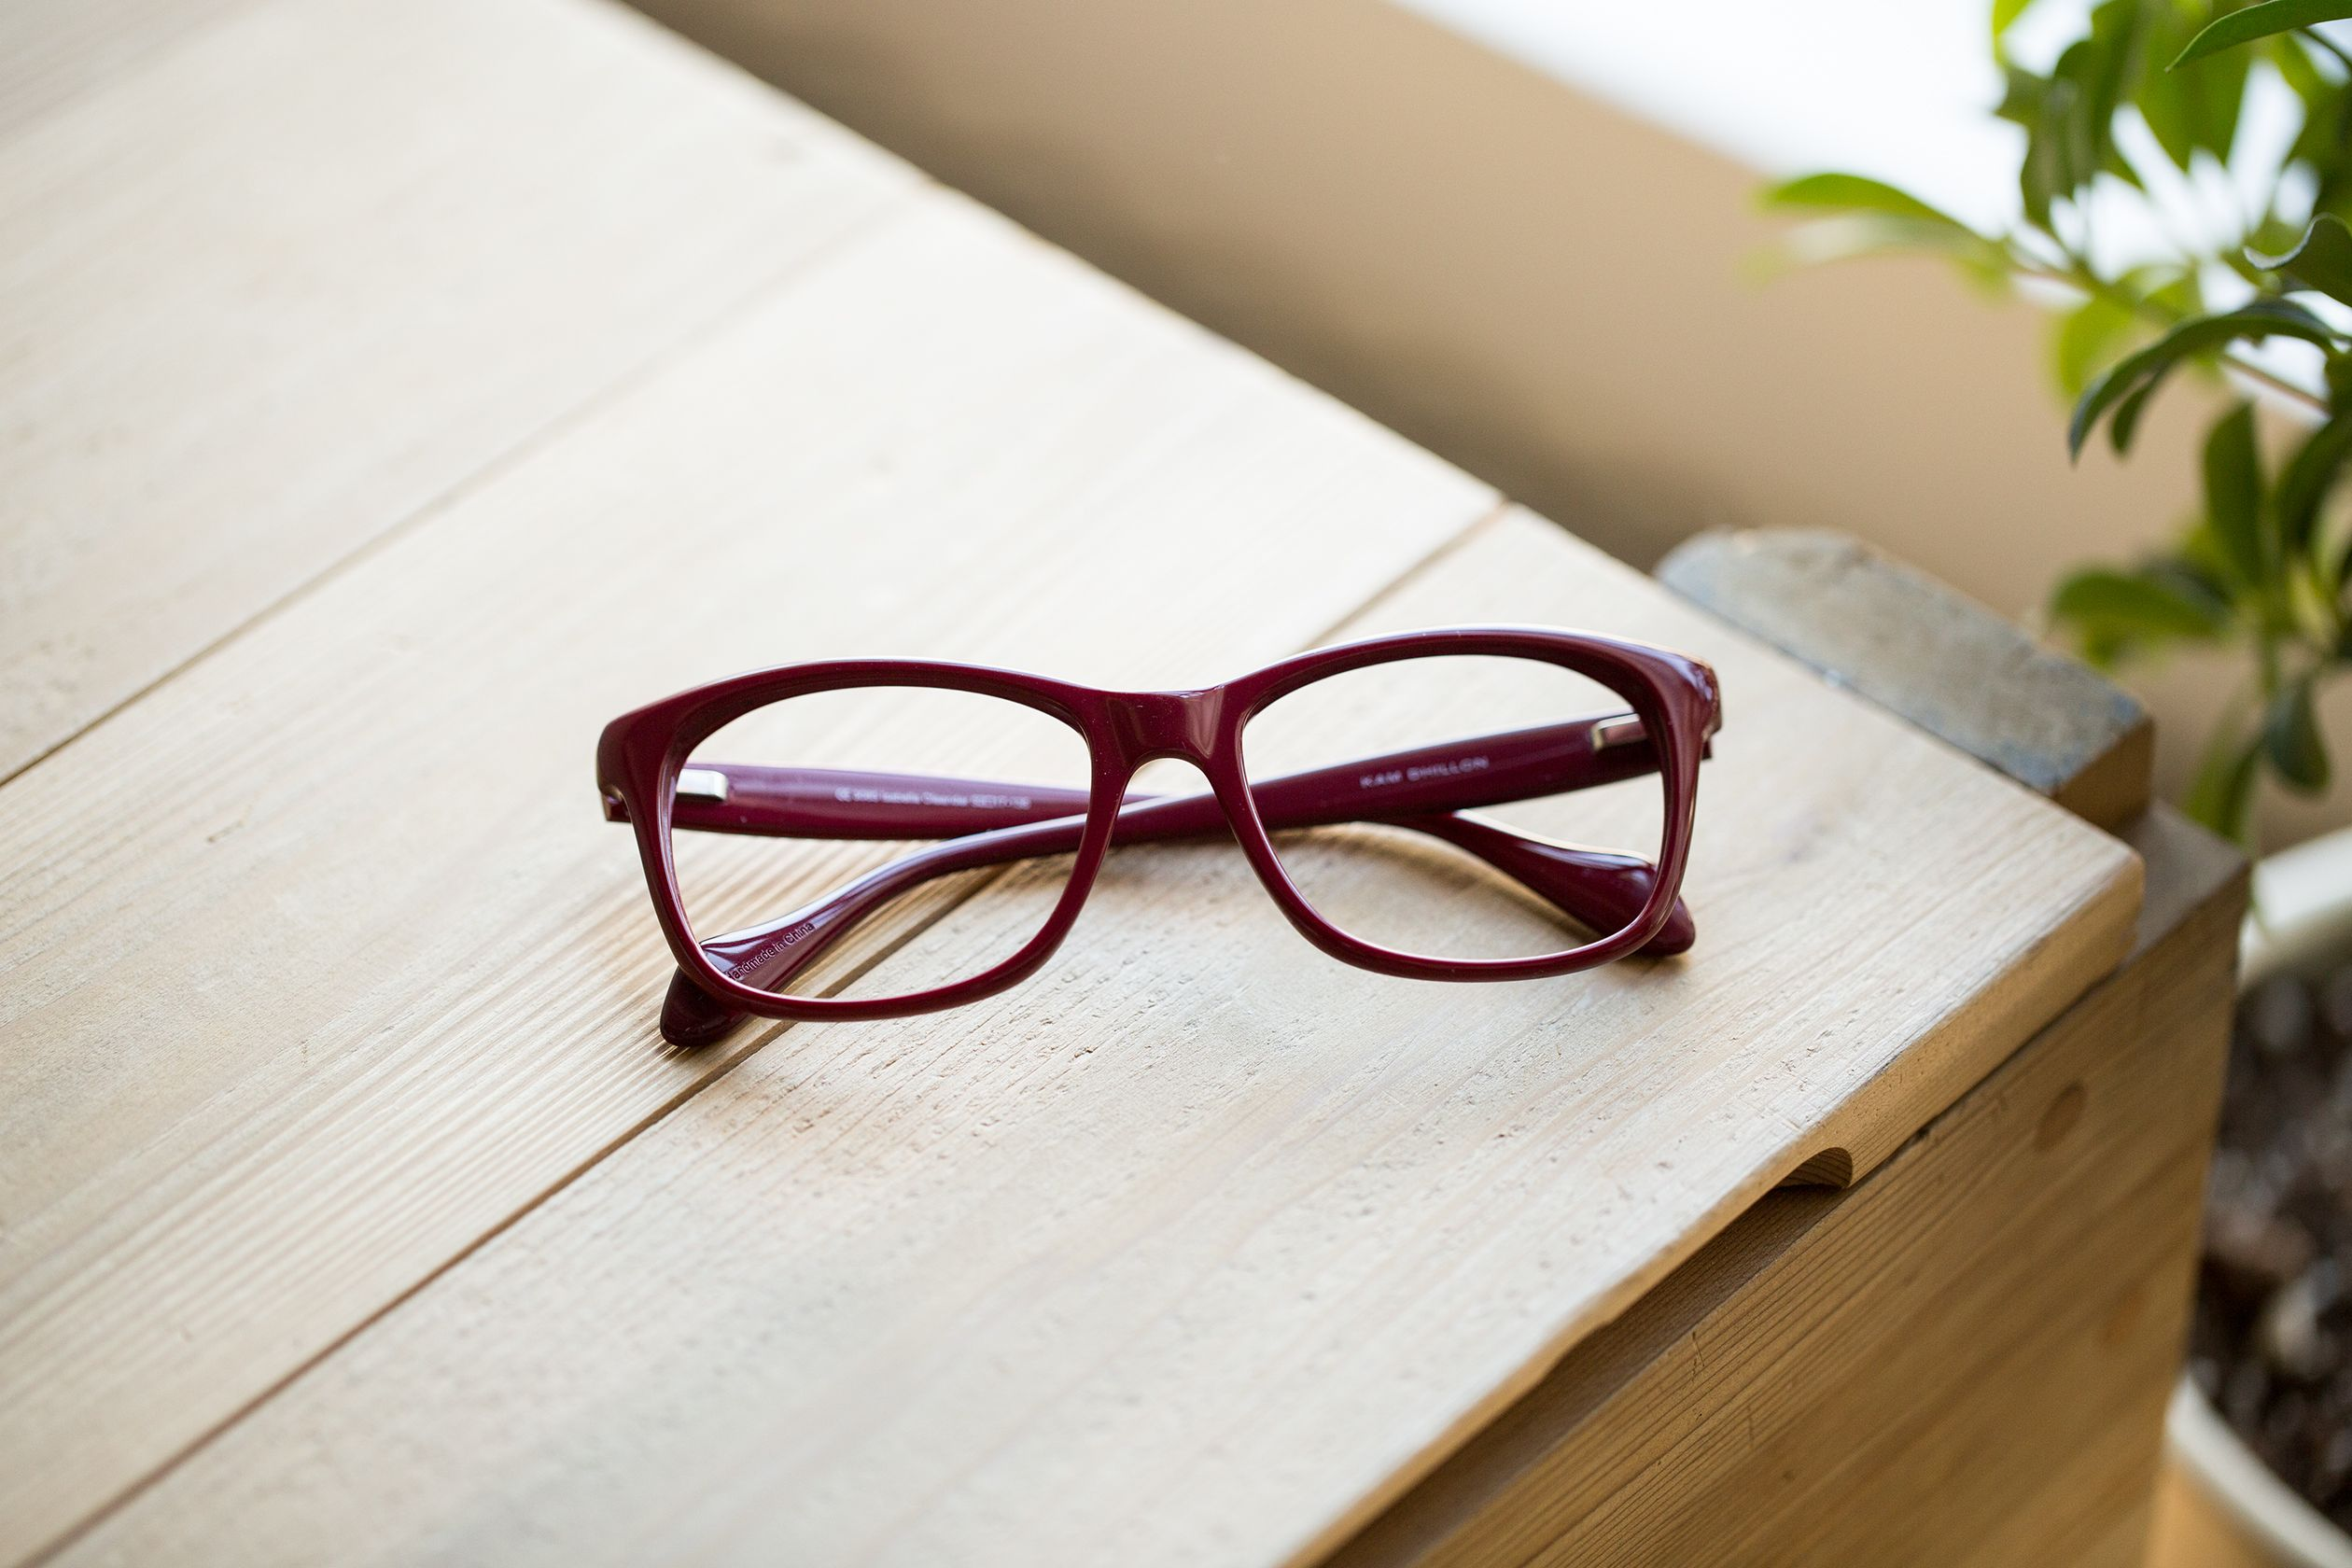 Kam dhillon eleni with images glasses eyewear online